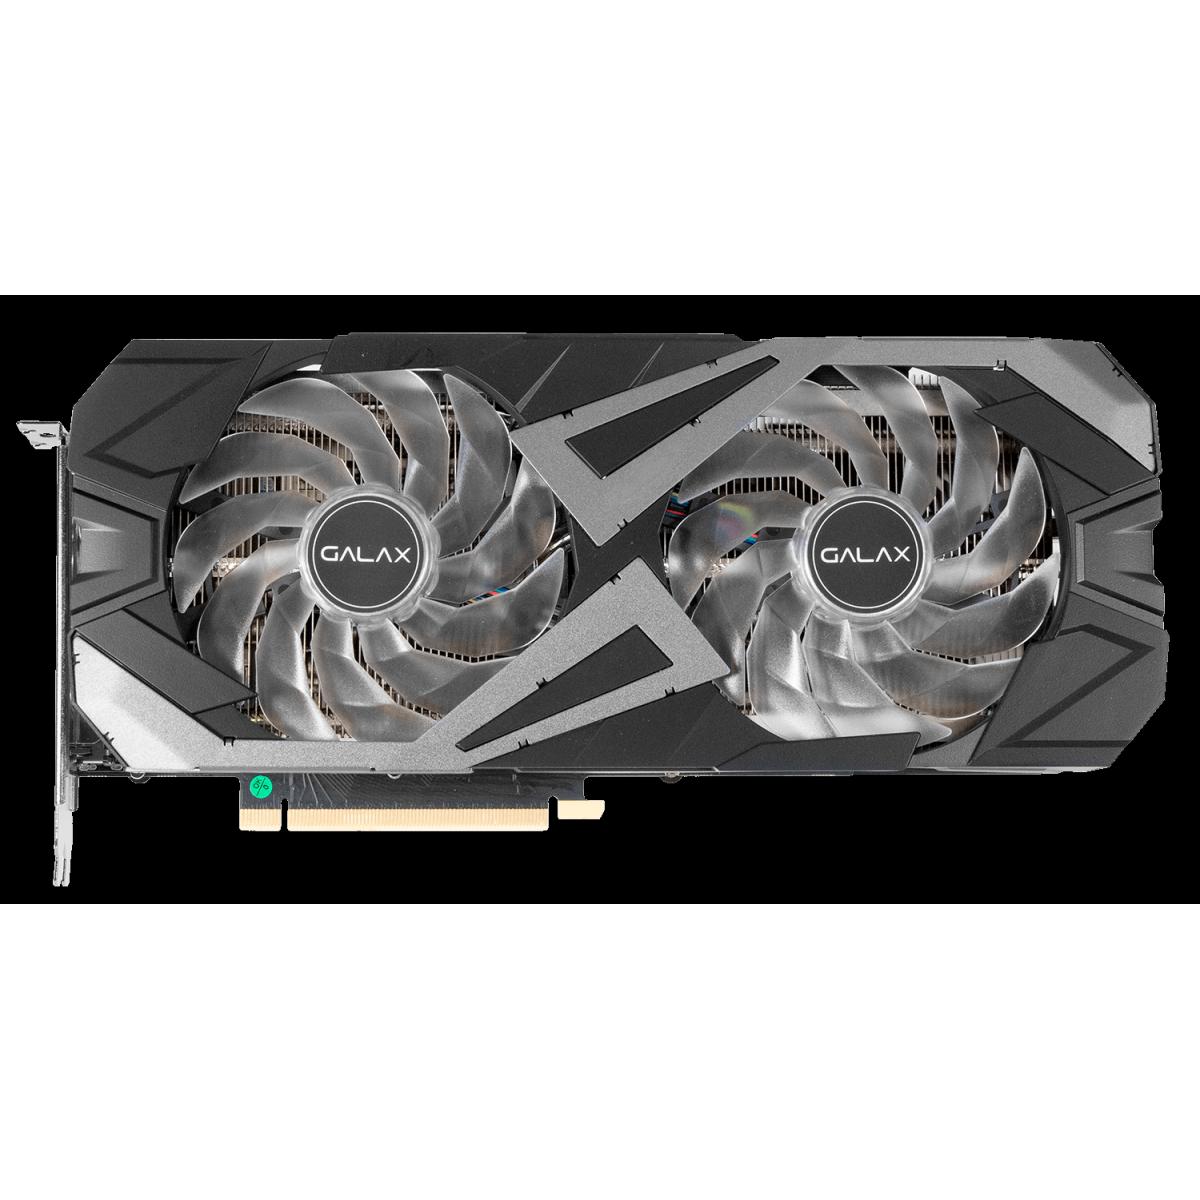 Placa de Vídeo Galax, GeForce, RTX 3070 EX, 1 Click OC, 8GB, GDDR6, 256Bit, 37NSL6MD2V7V